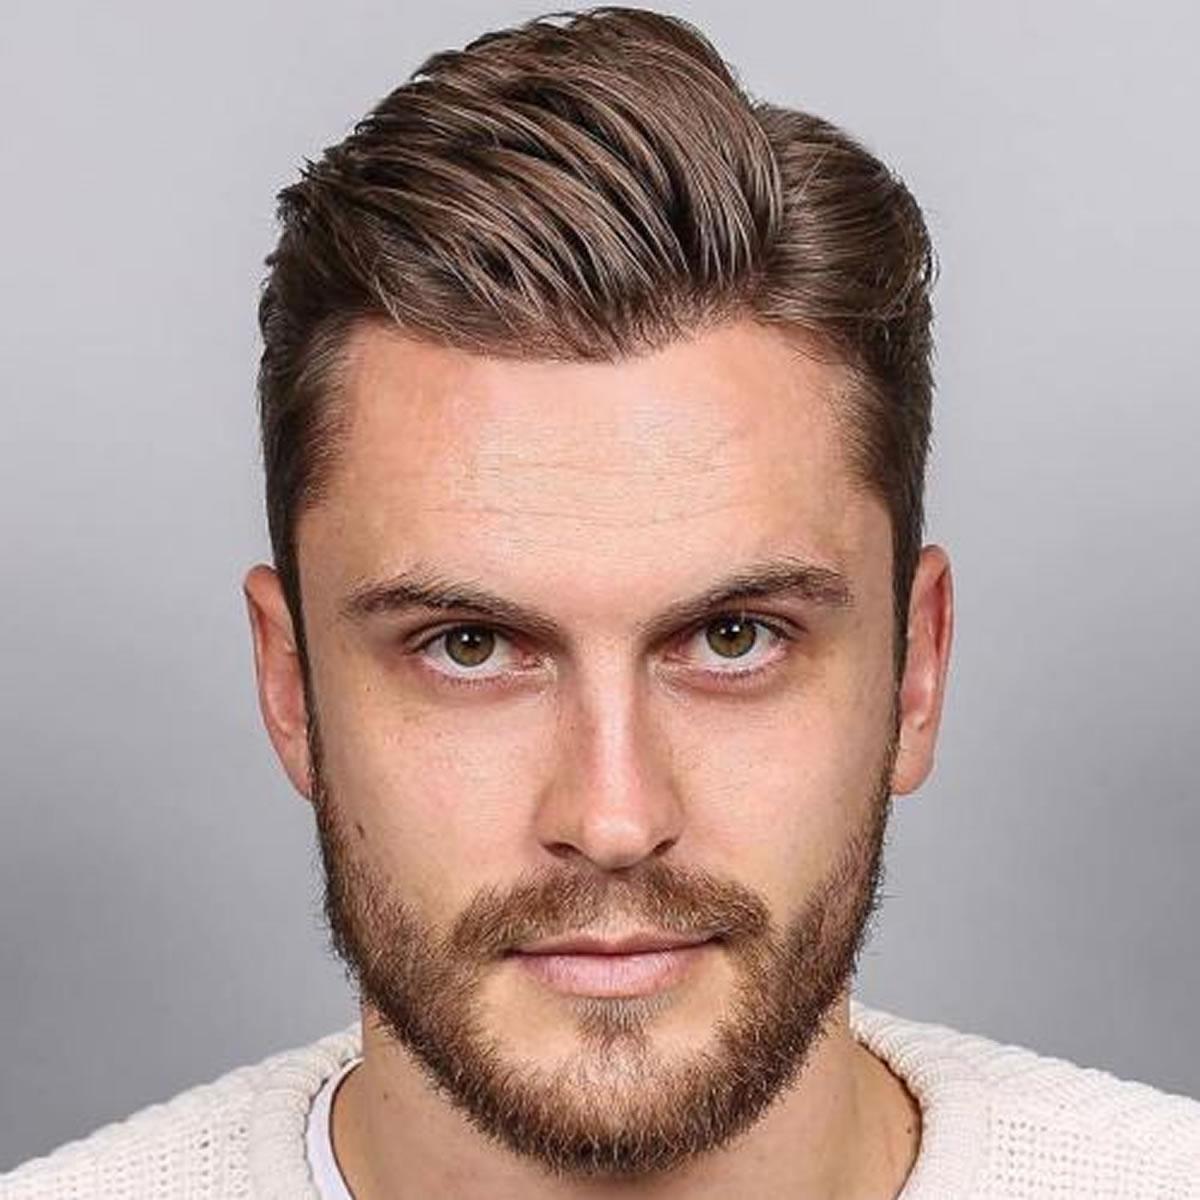 the_latest_haircut_for_men_2018_22.jpg